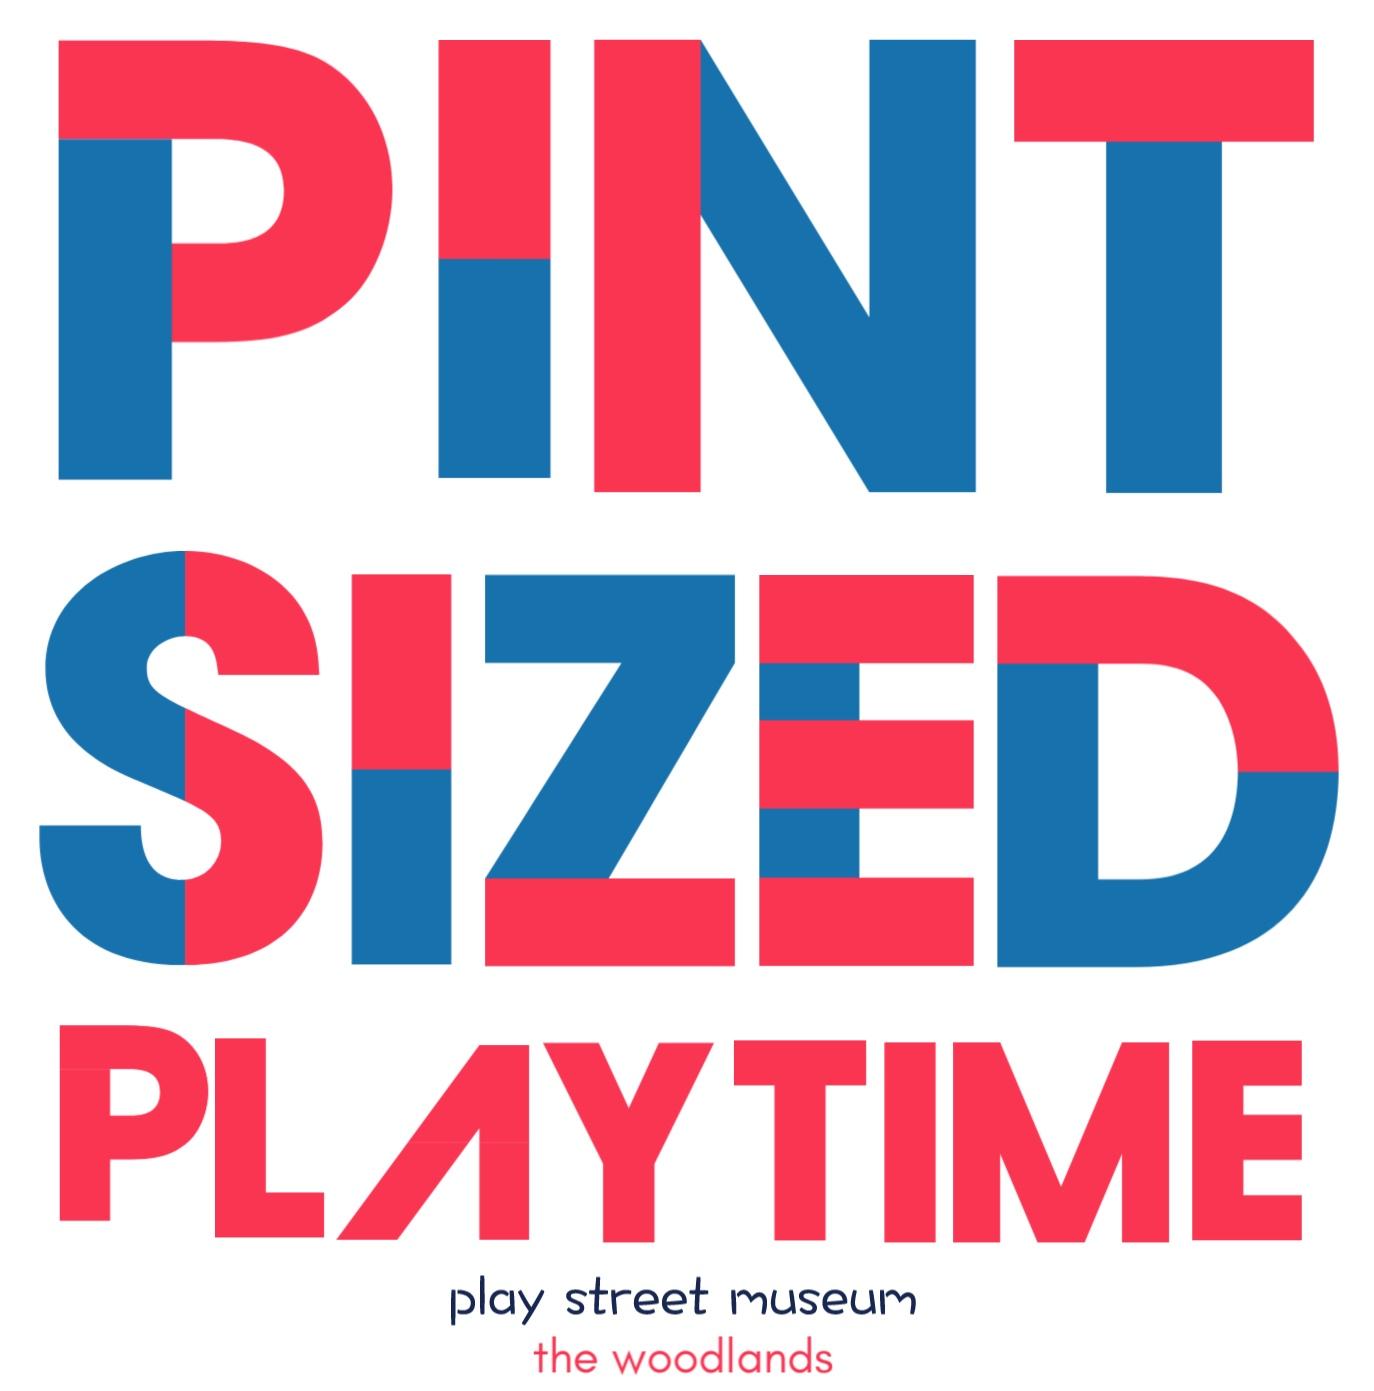 Pint+Sized+Playtime+TW+5_25.jpg